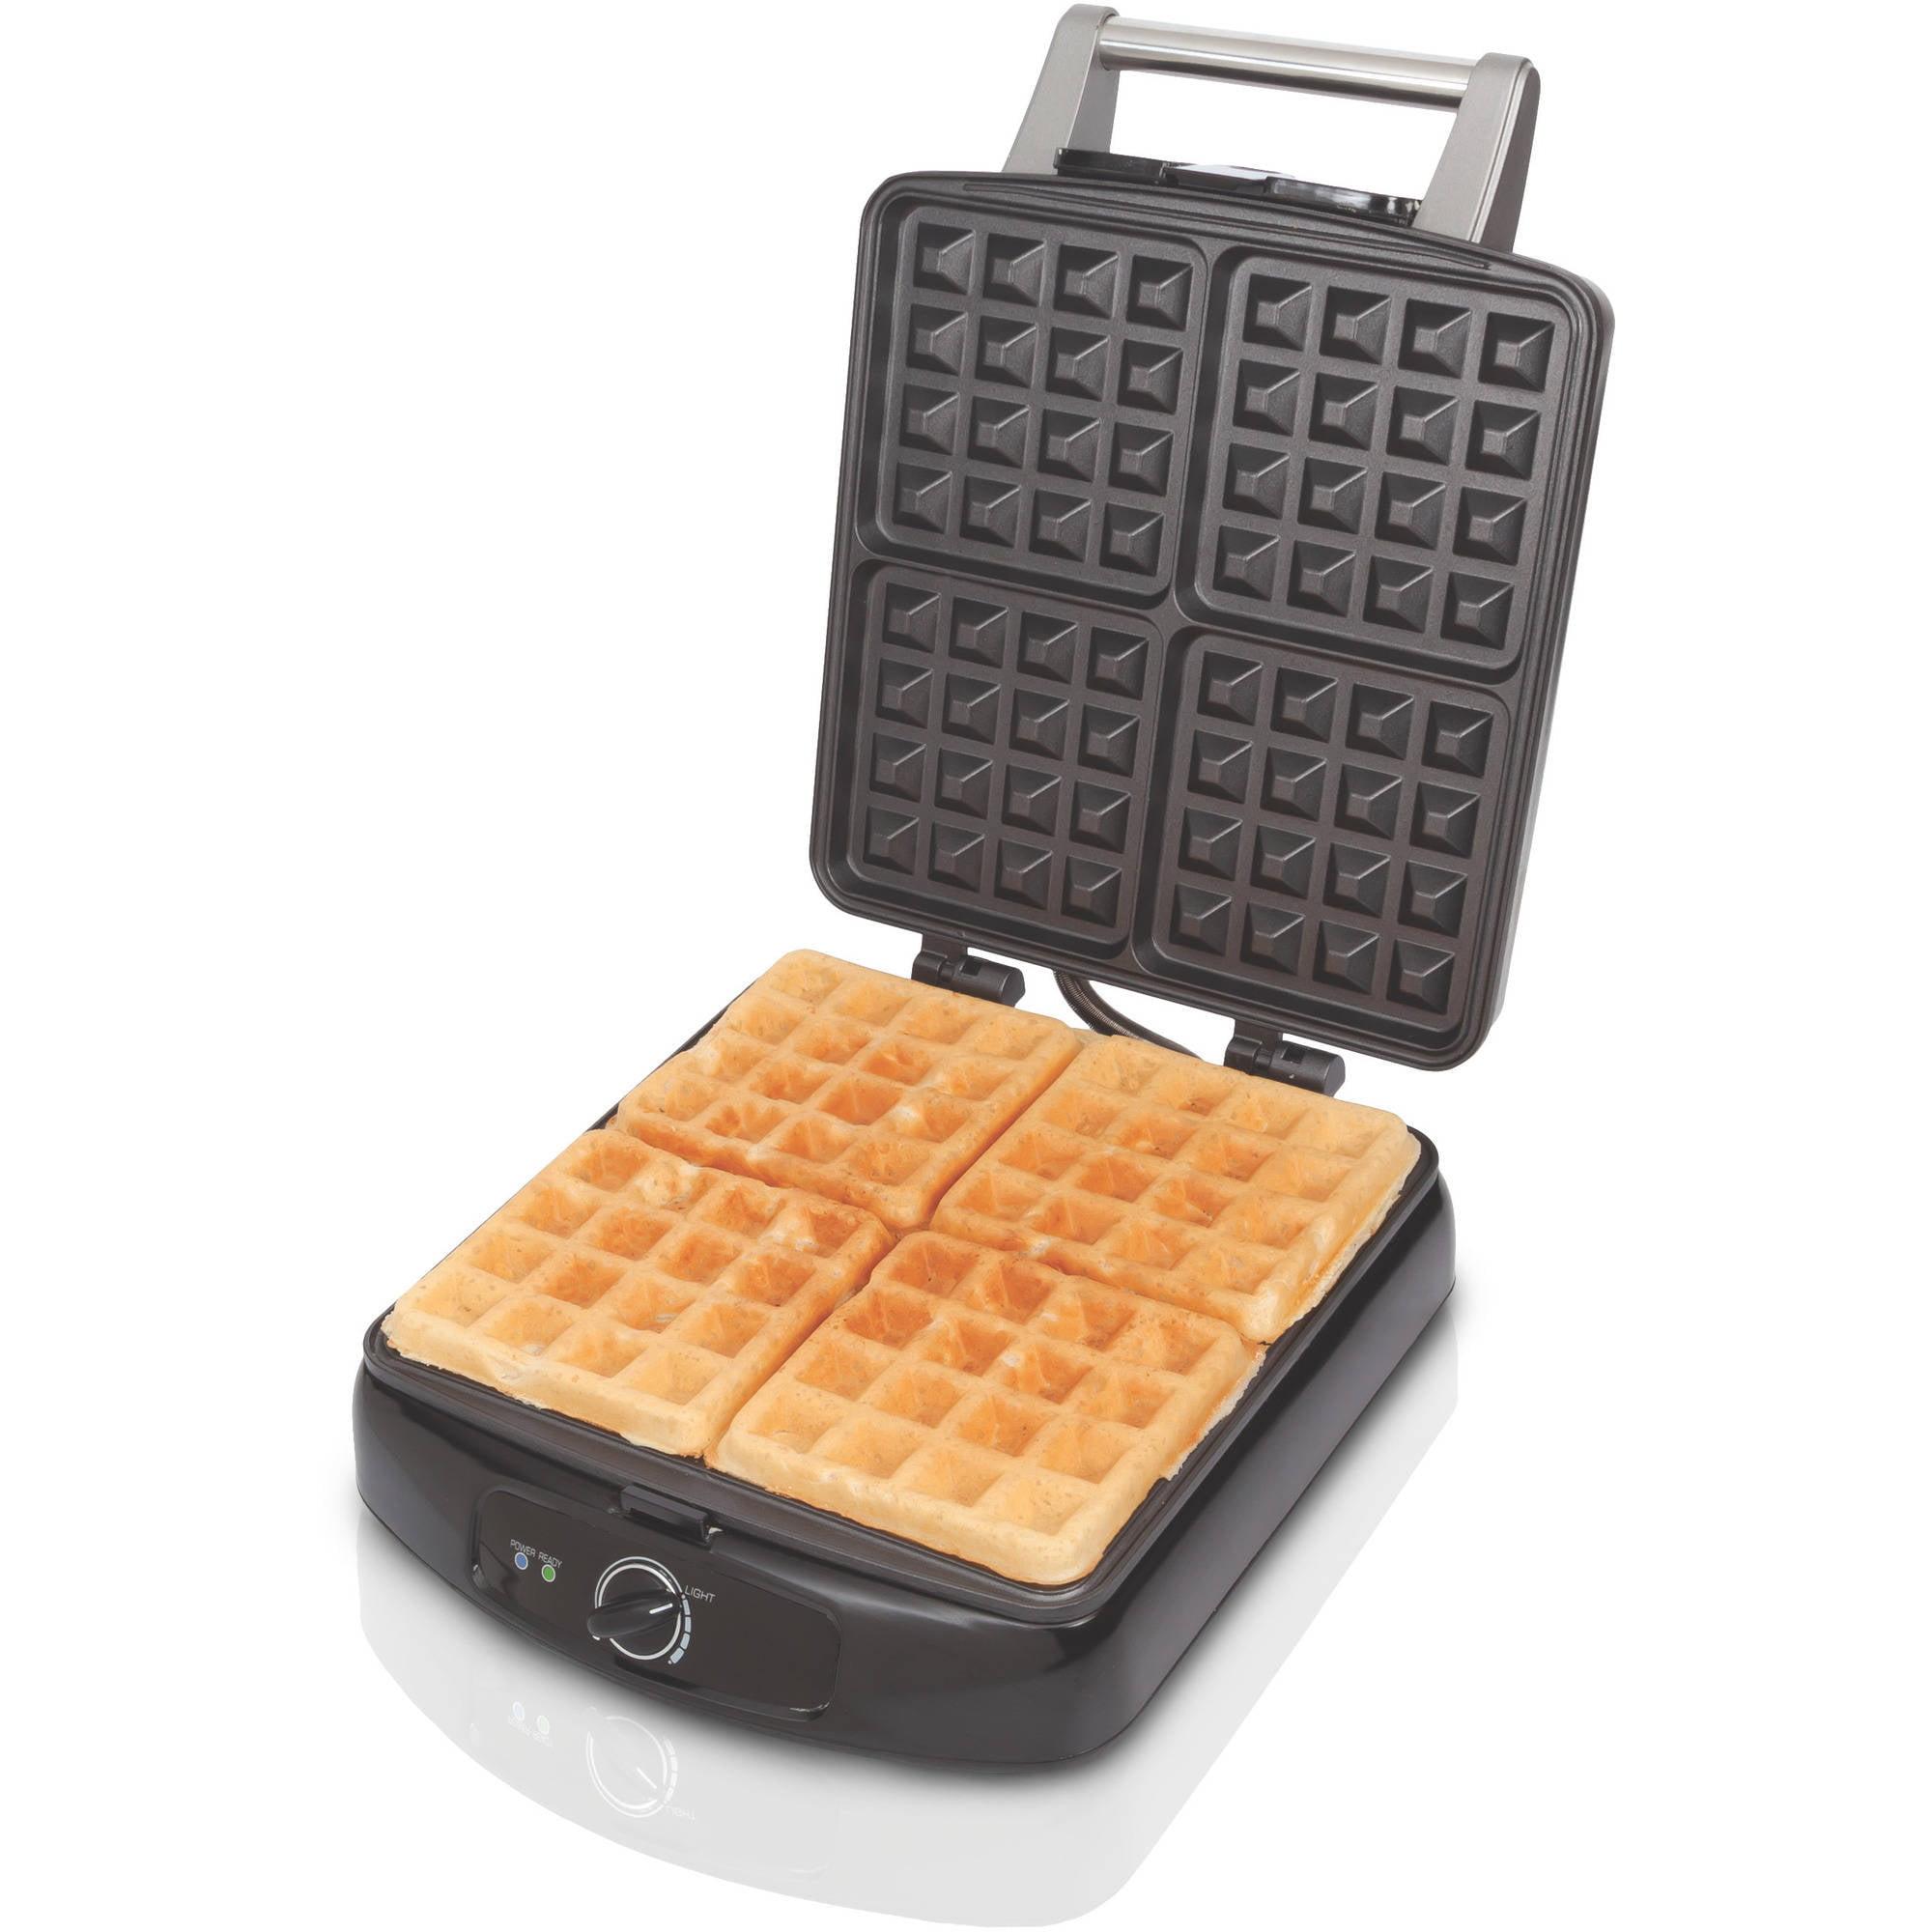 Farberware 4 Slice Waffle Maker, 1 Each